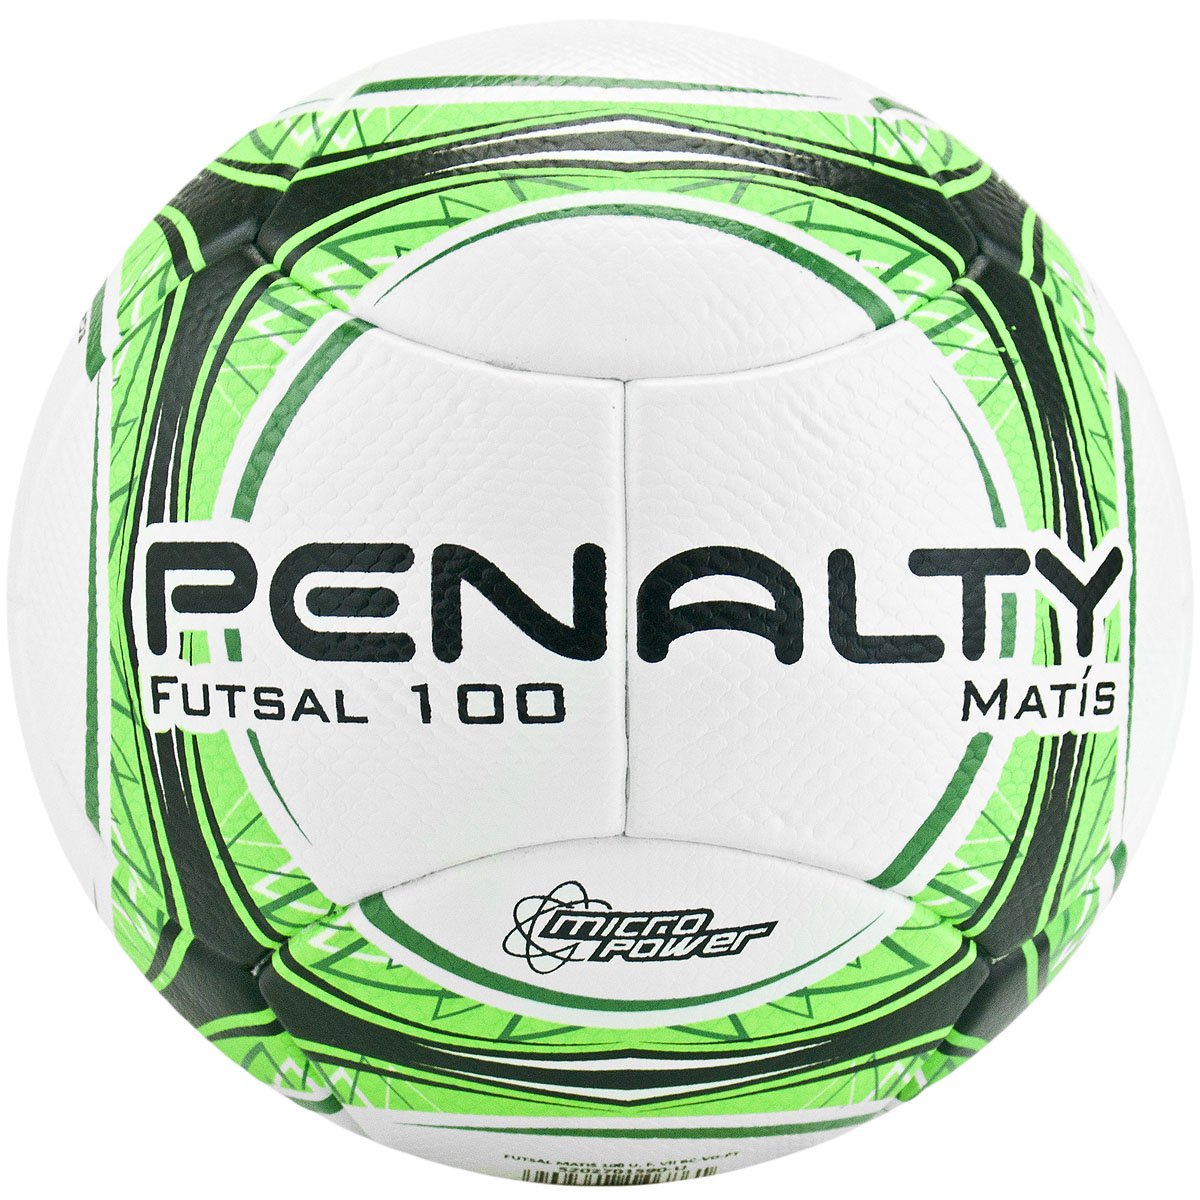 Bola Penalty Futsal Matis 100 Ultra Fusion VII 520  5f2786a33a62d